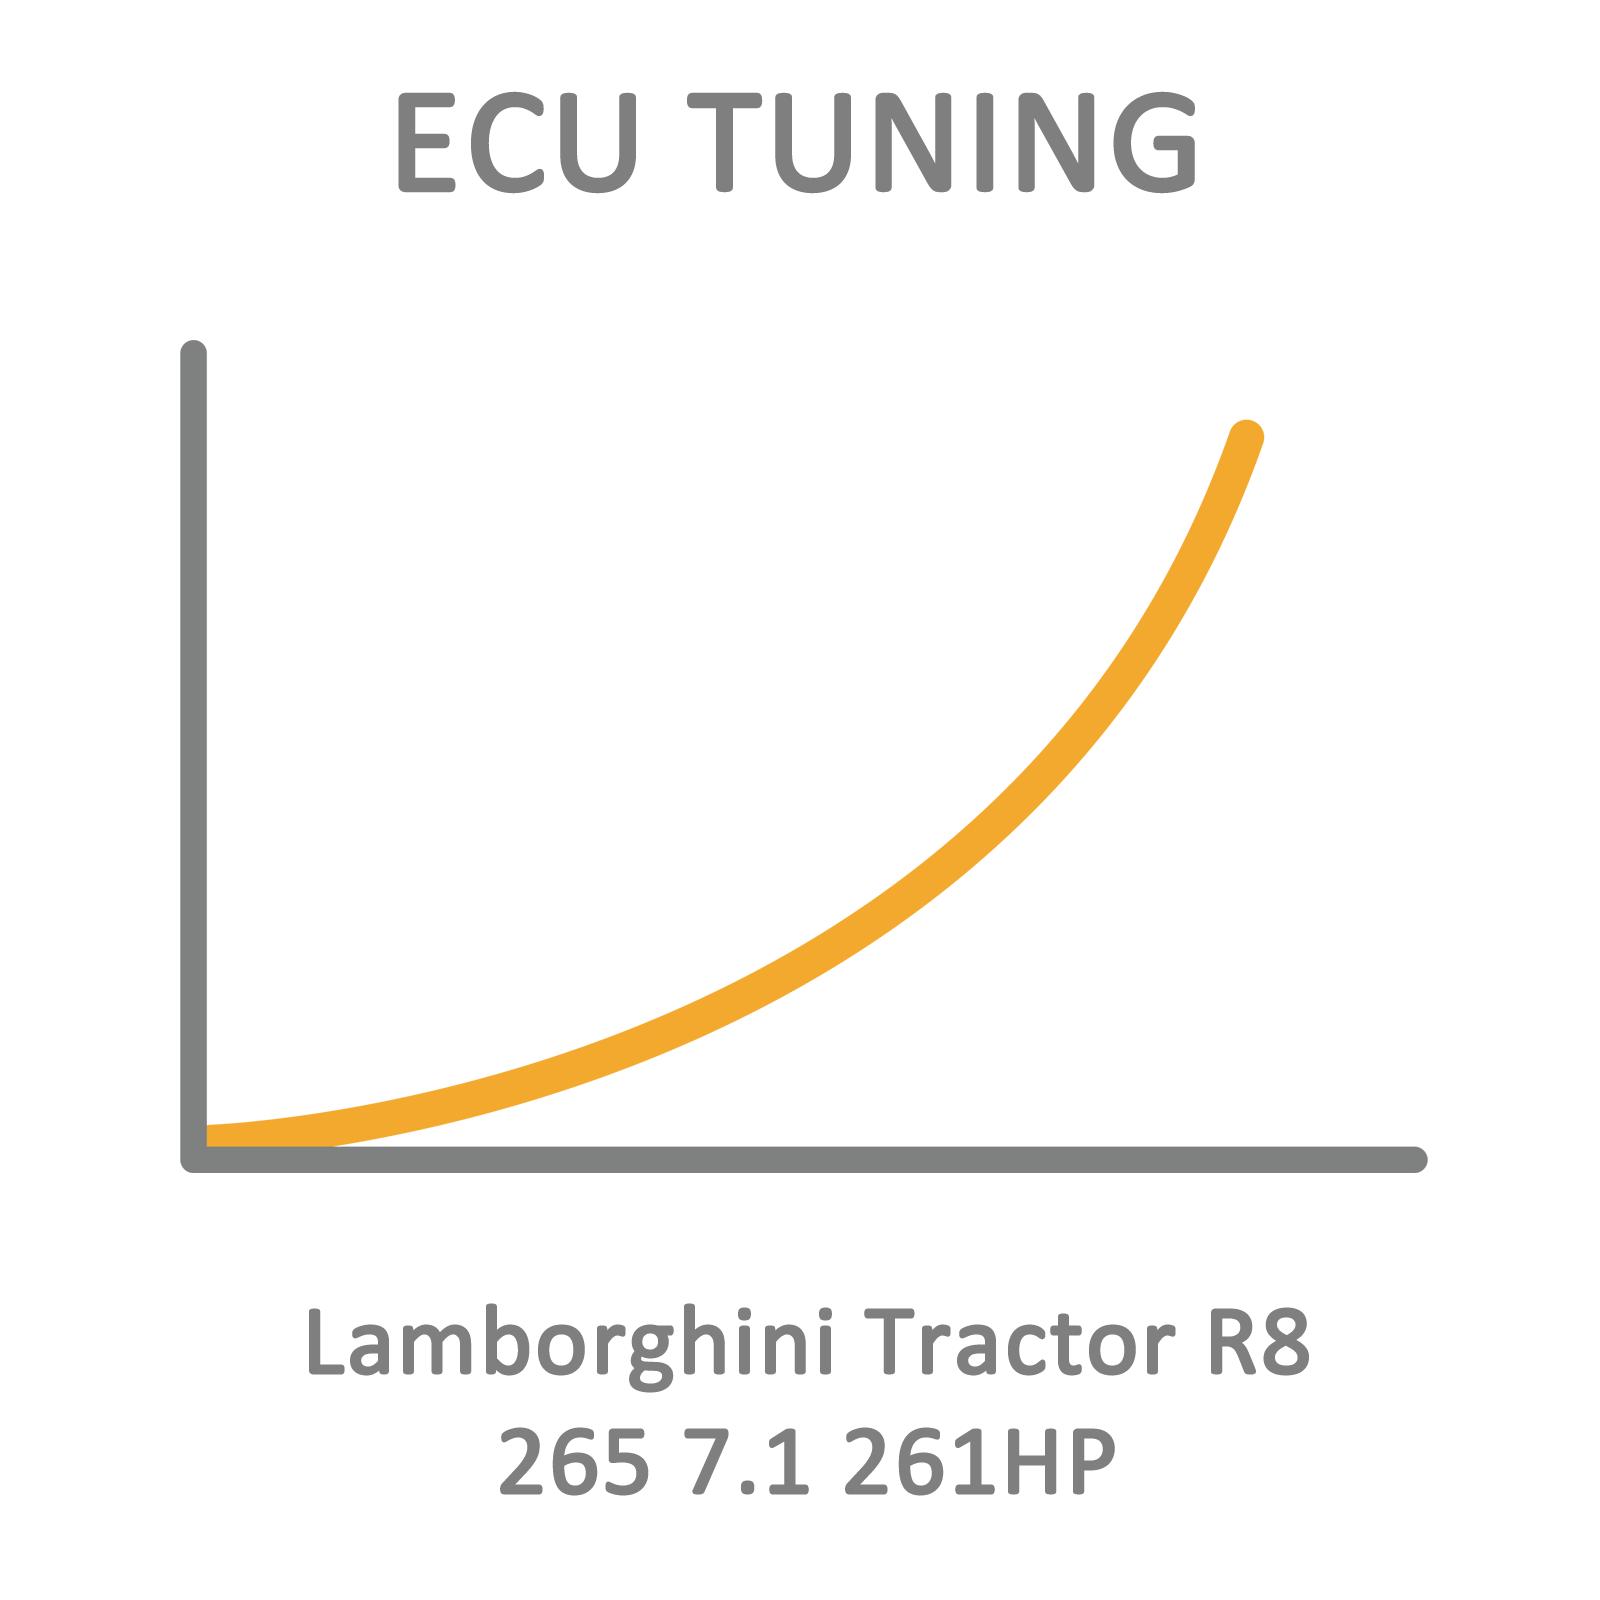 Lamborghini Tractor R8 265 7.1 261HP ECU Tuning Remapping